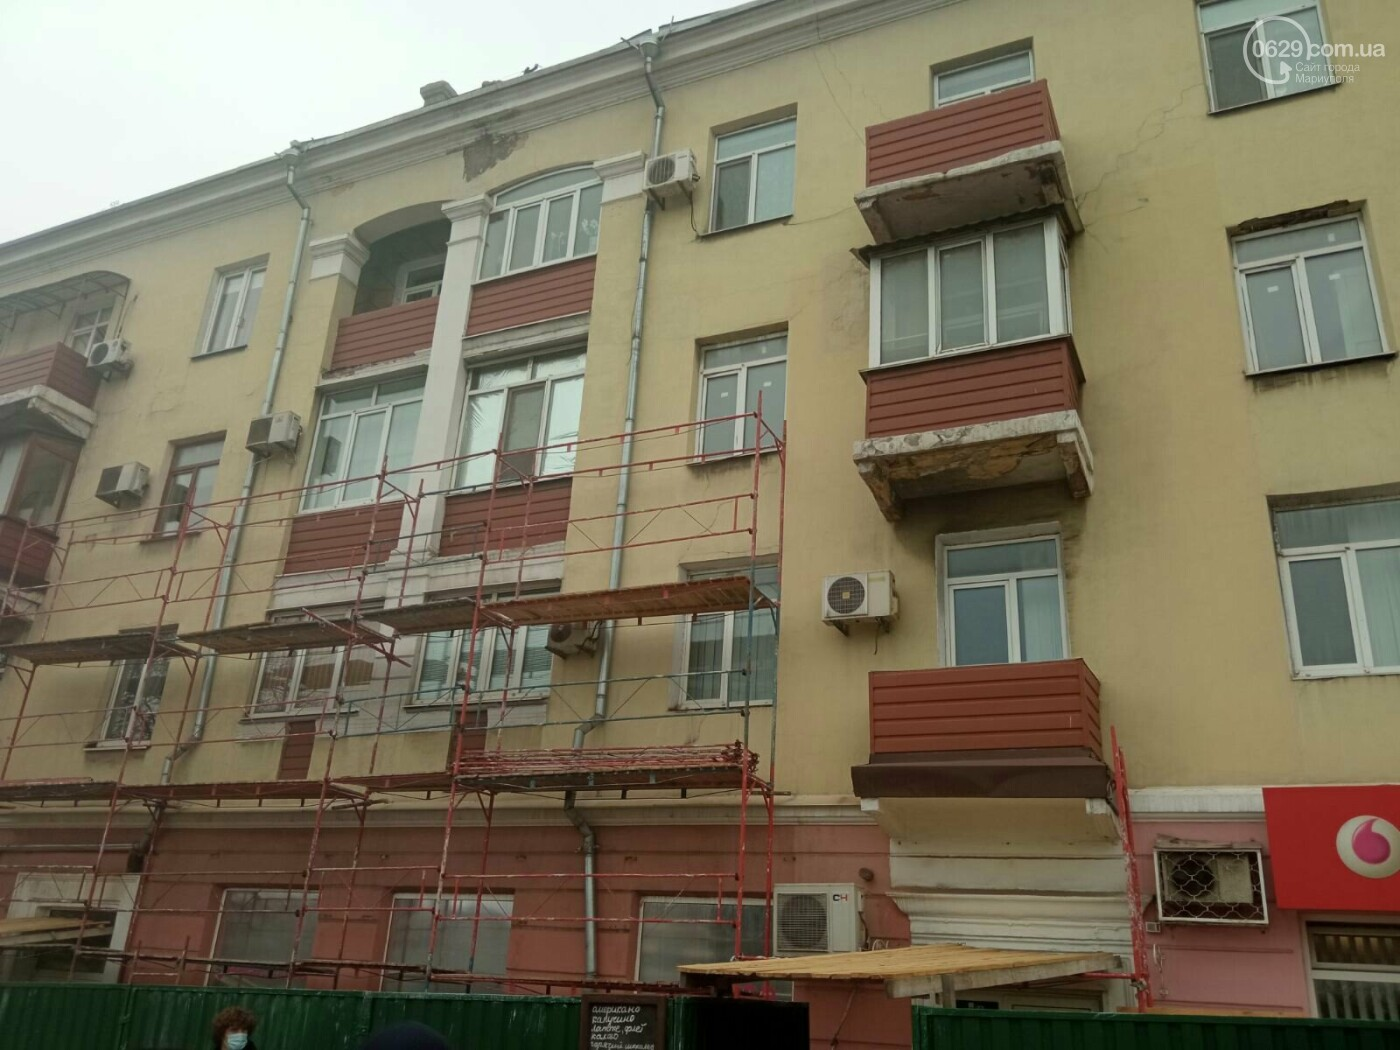 В Мариуполе отремонтируют здание с часами, - ФОТО, фото-1